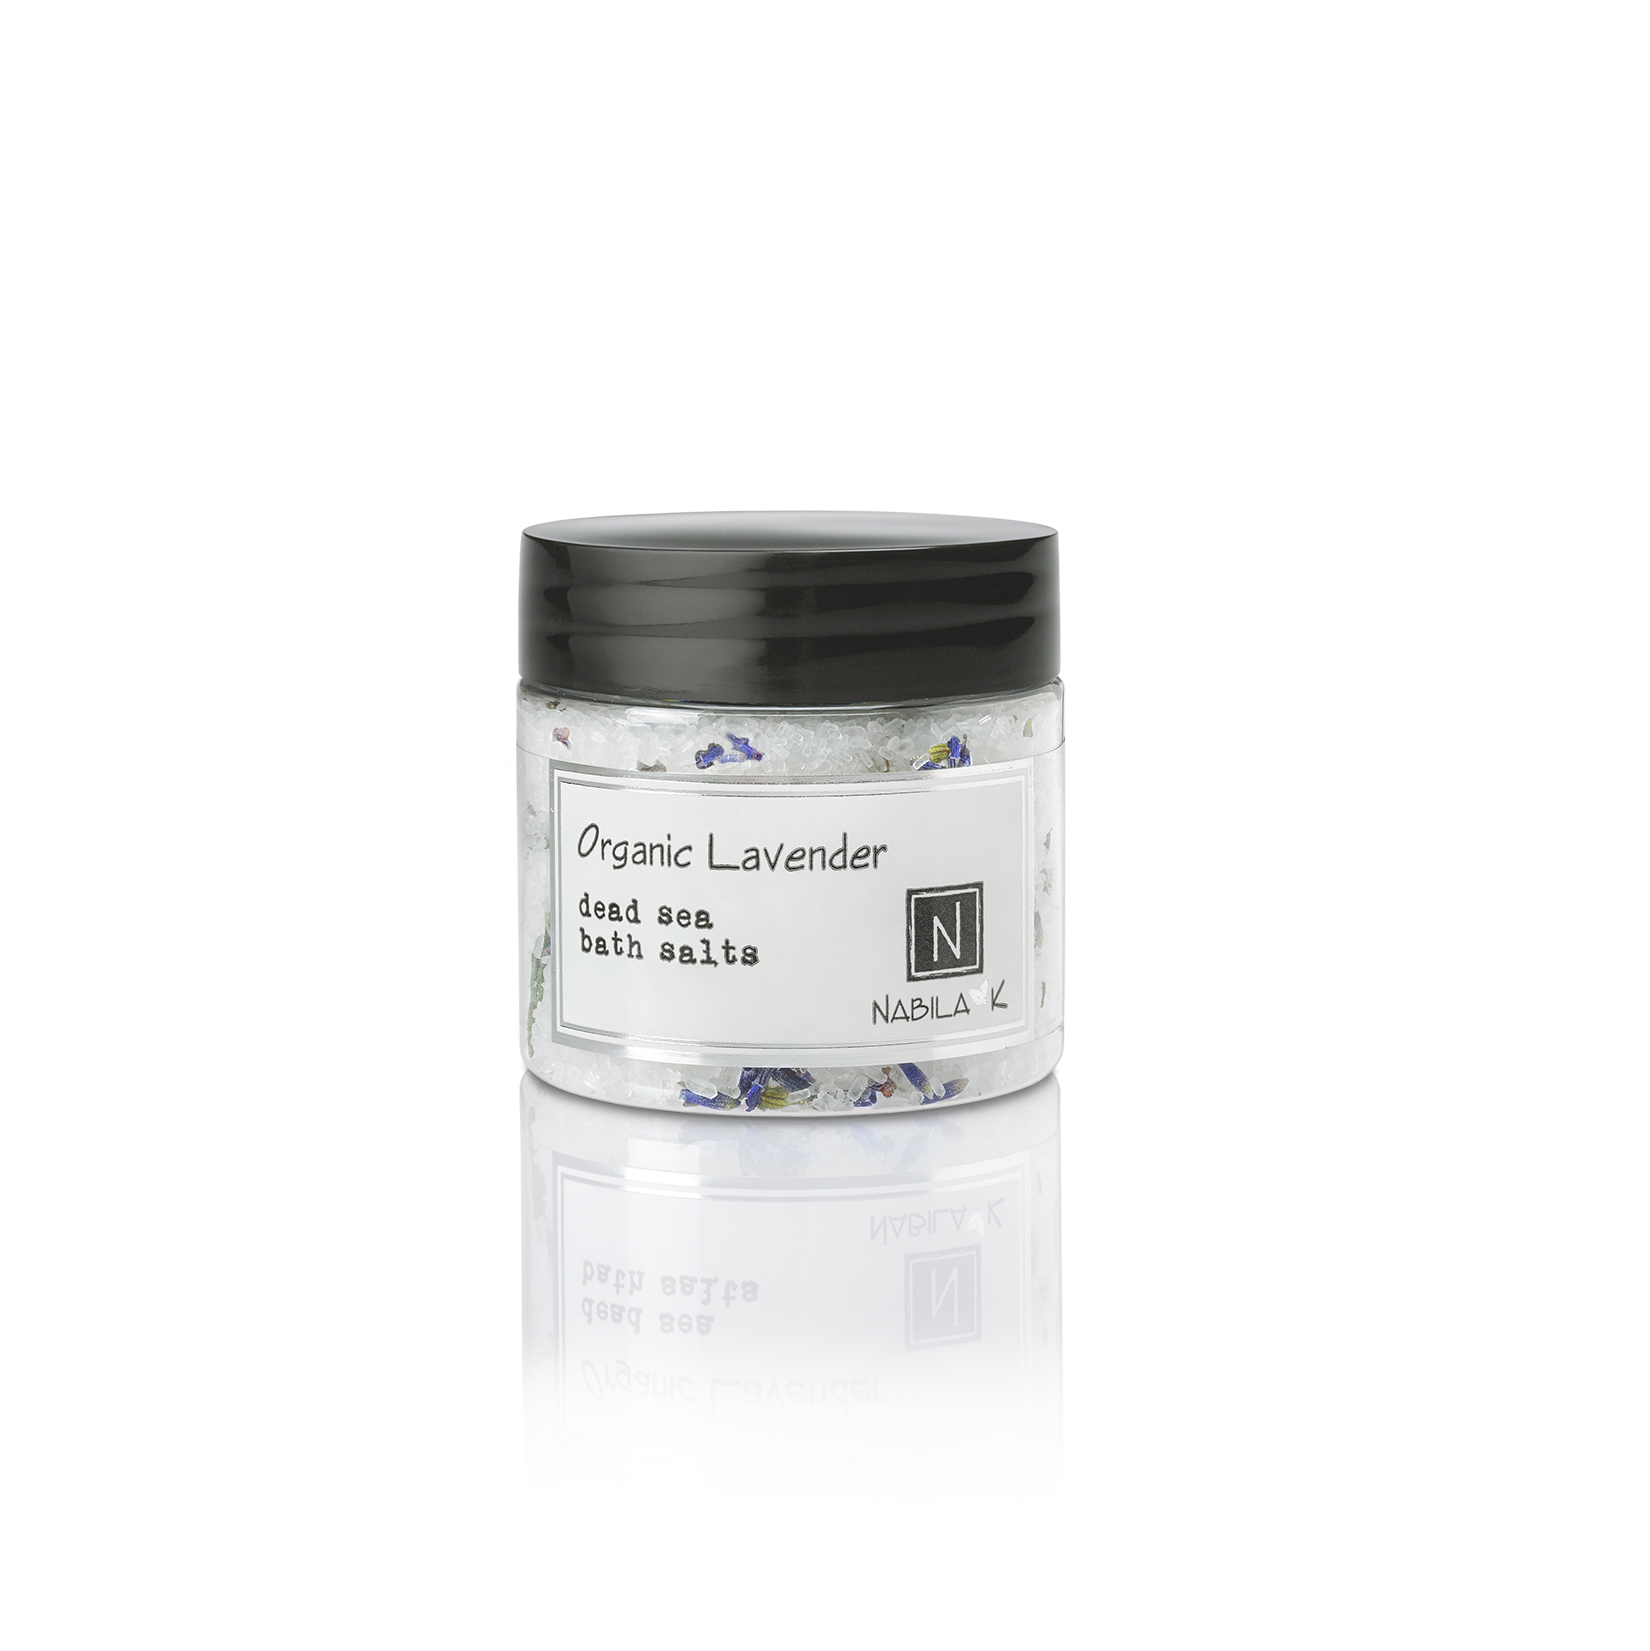 1 Travel Sized Version of Nabila K's Organic Lavender Dead Sea Bath Salts